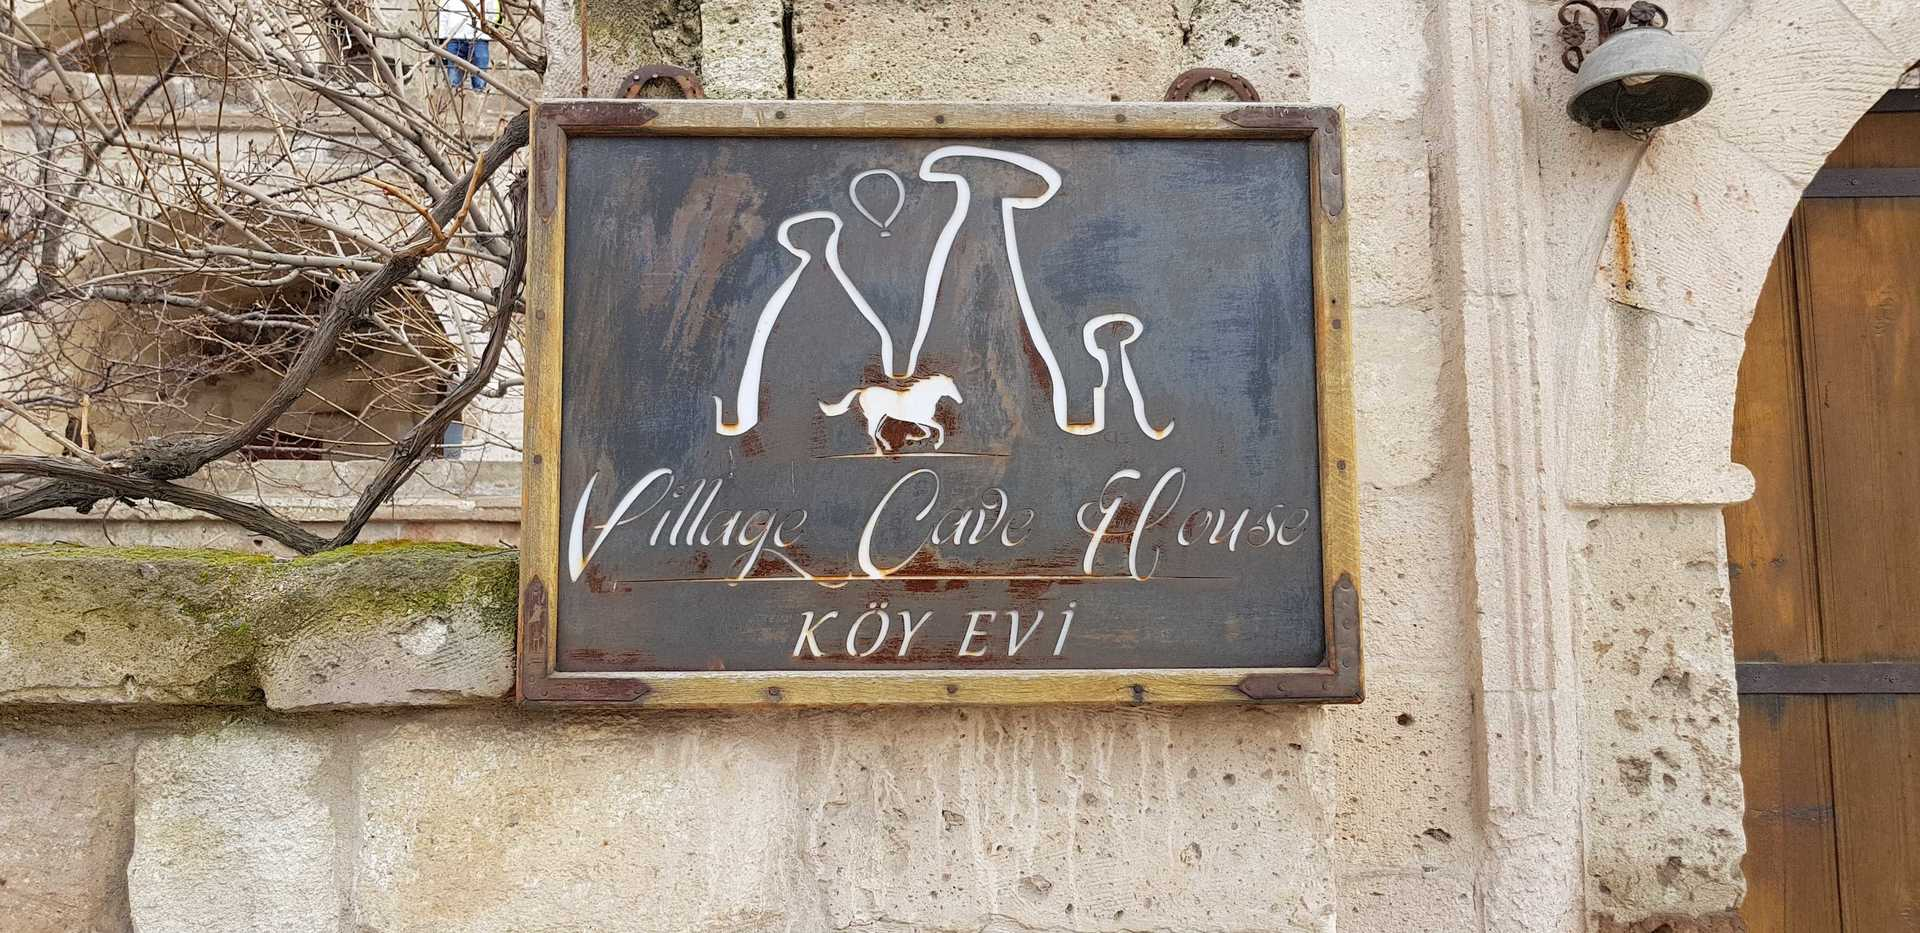 VILLAGE CAVE HOTEL image